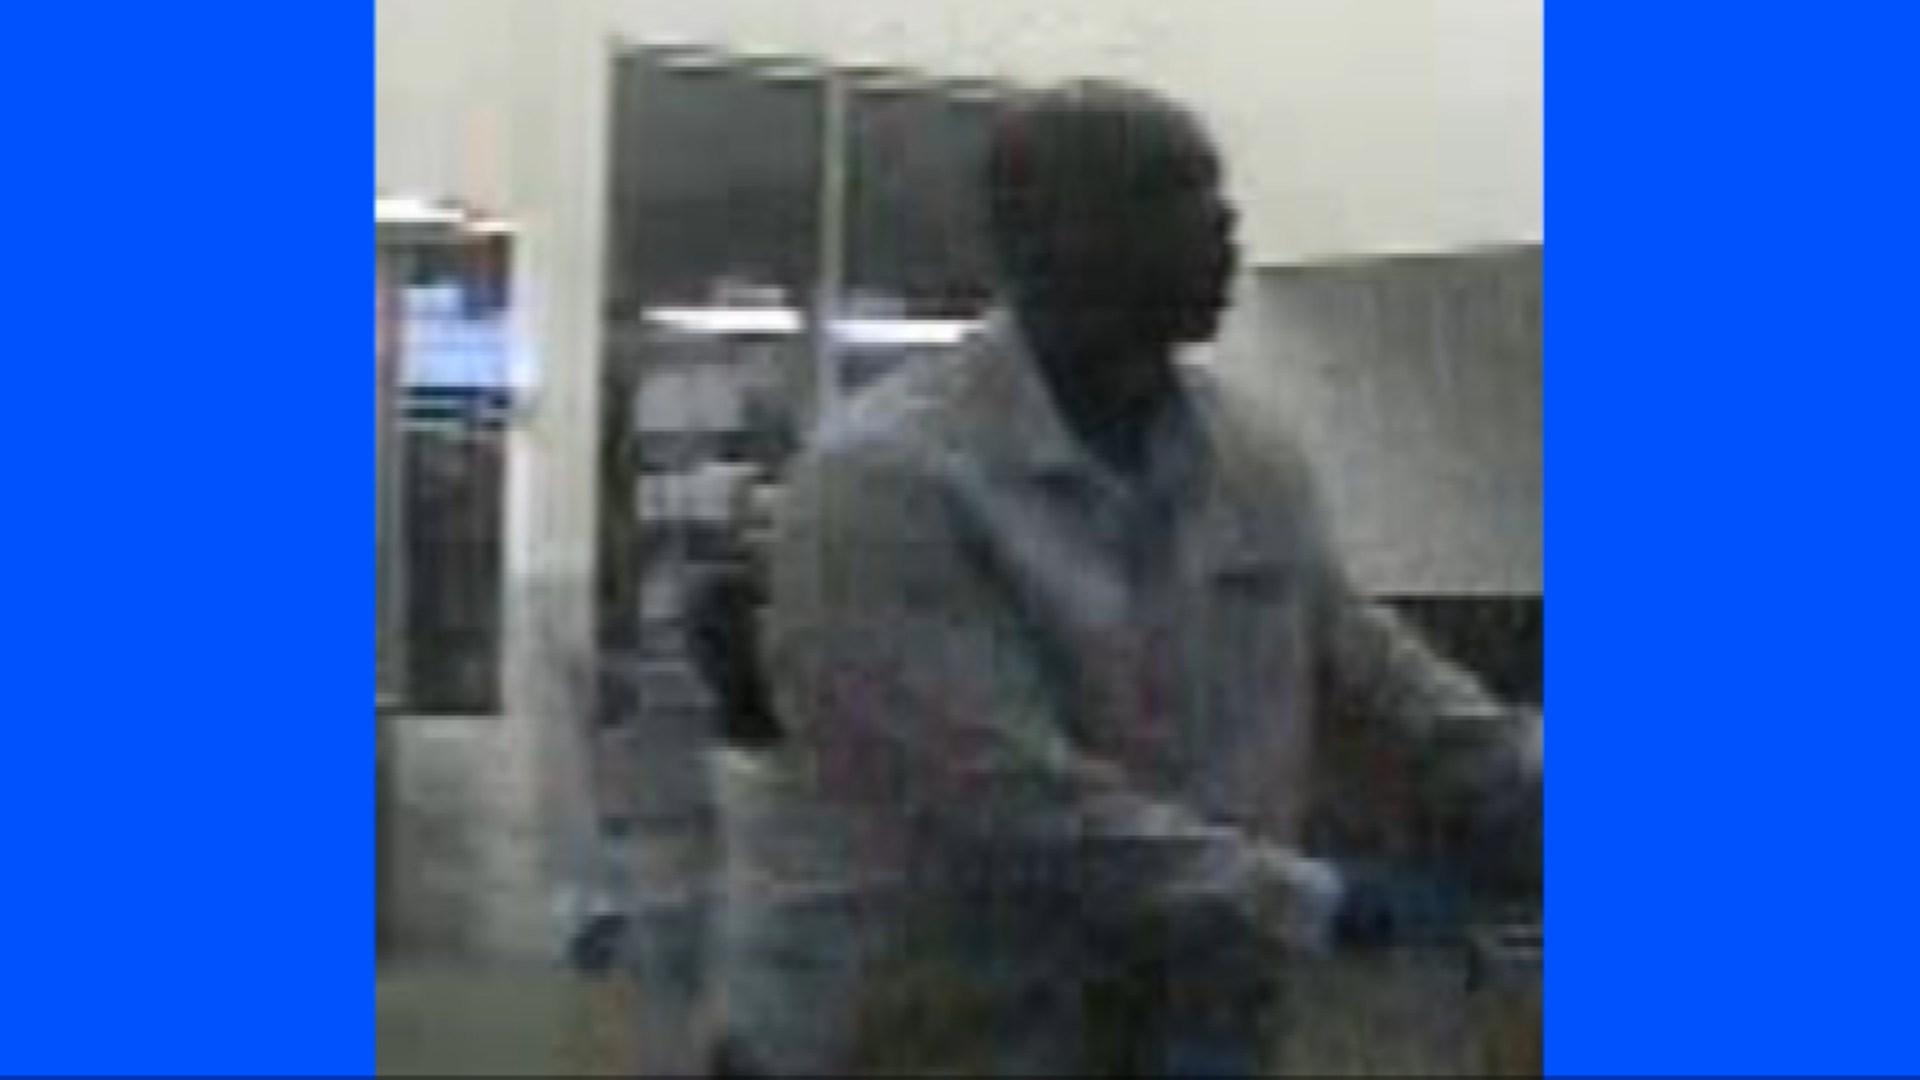 Georgia Walmart employee shot and killed by alleged shoplifter - CBS